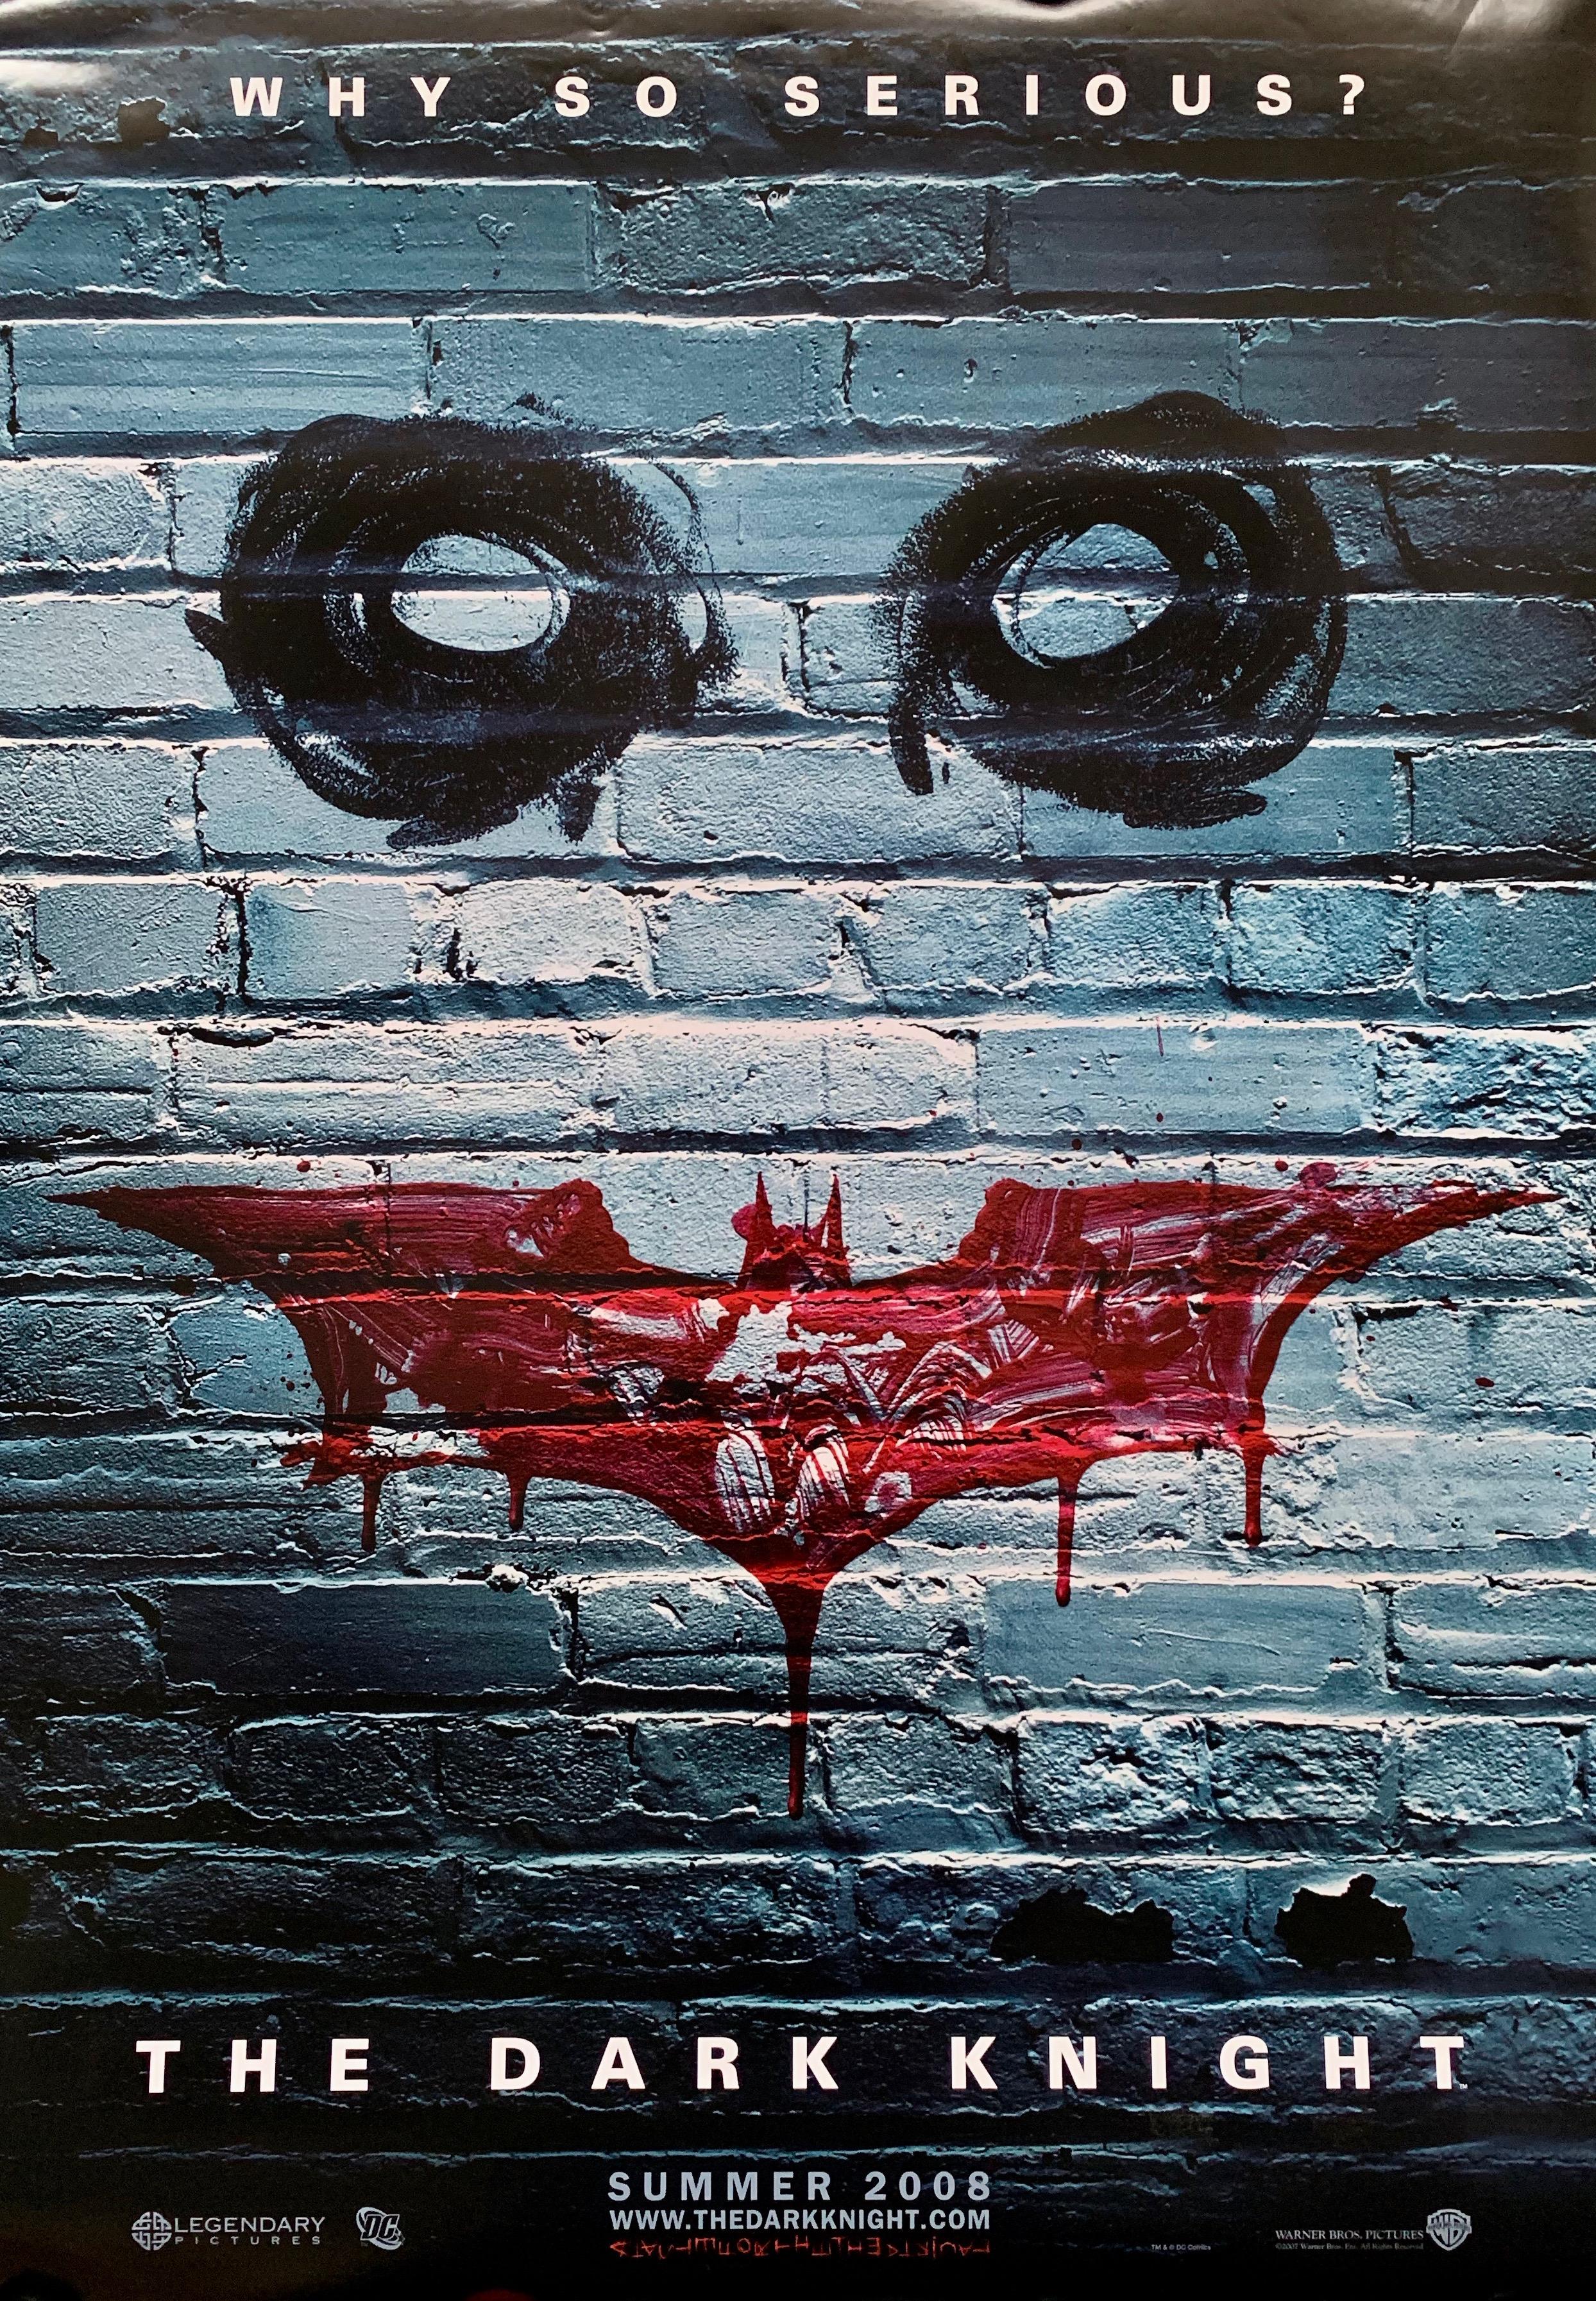 THE DARK KNIGHT Movie PHOTO Print POSTER Film 2008 Batman The Joker Glossy Art 1